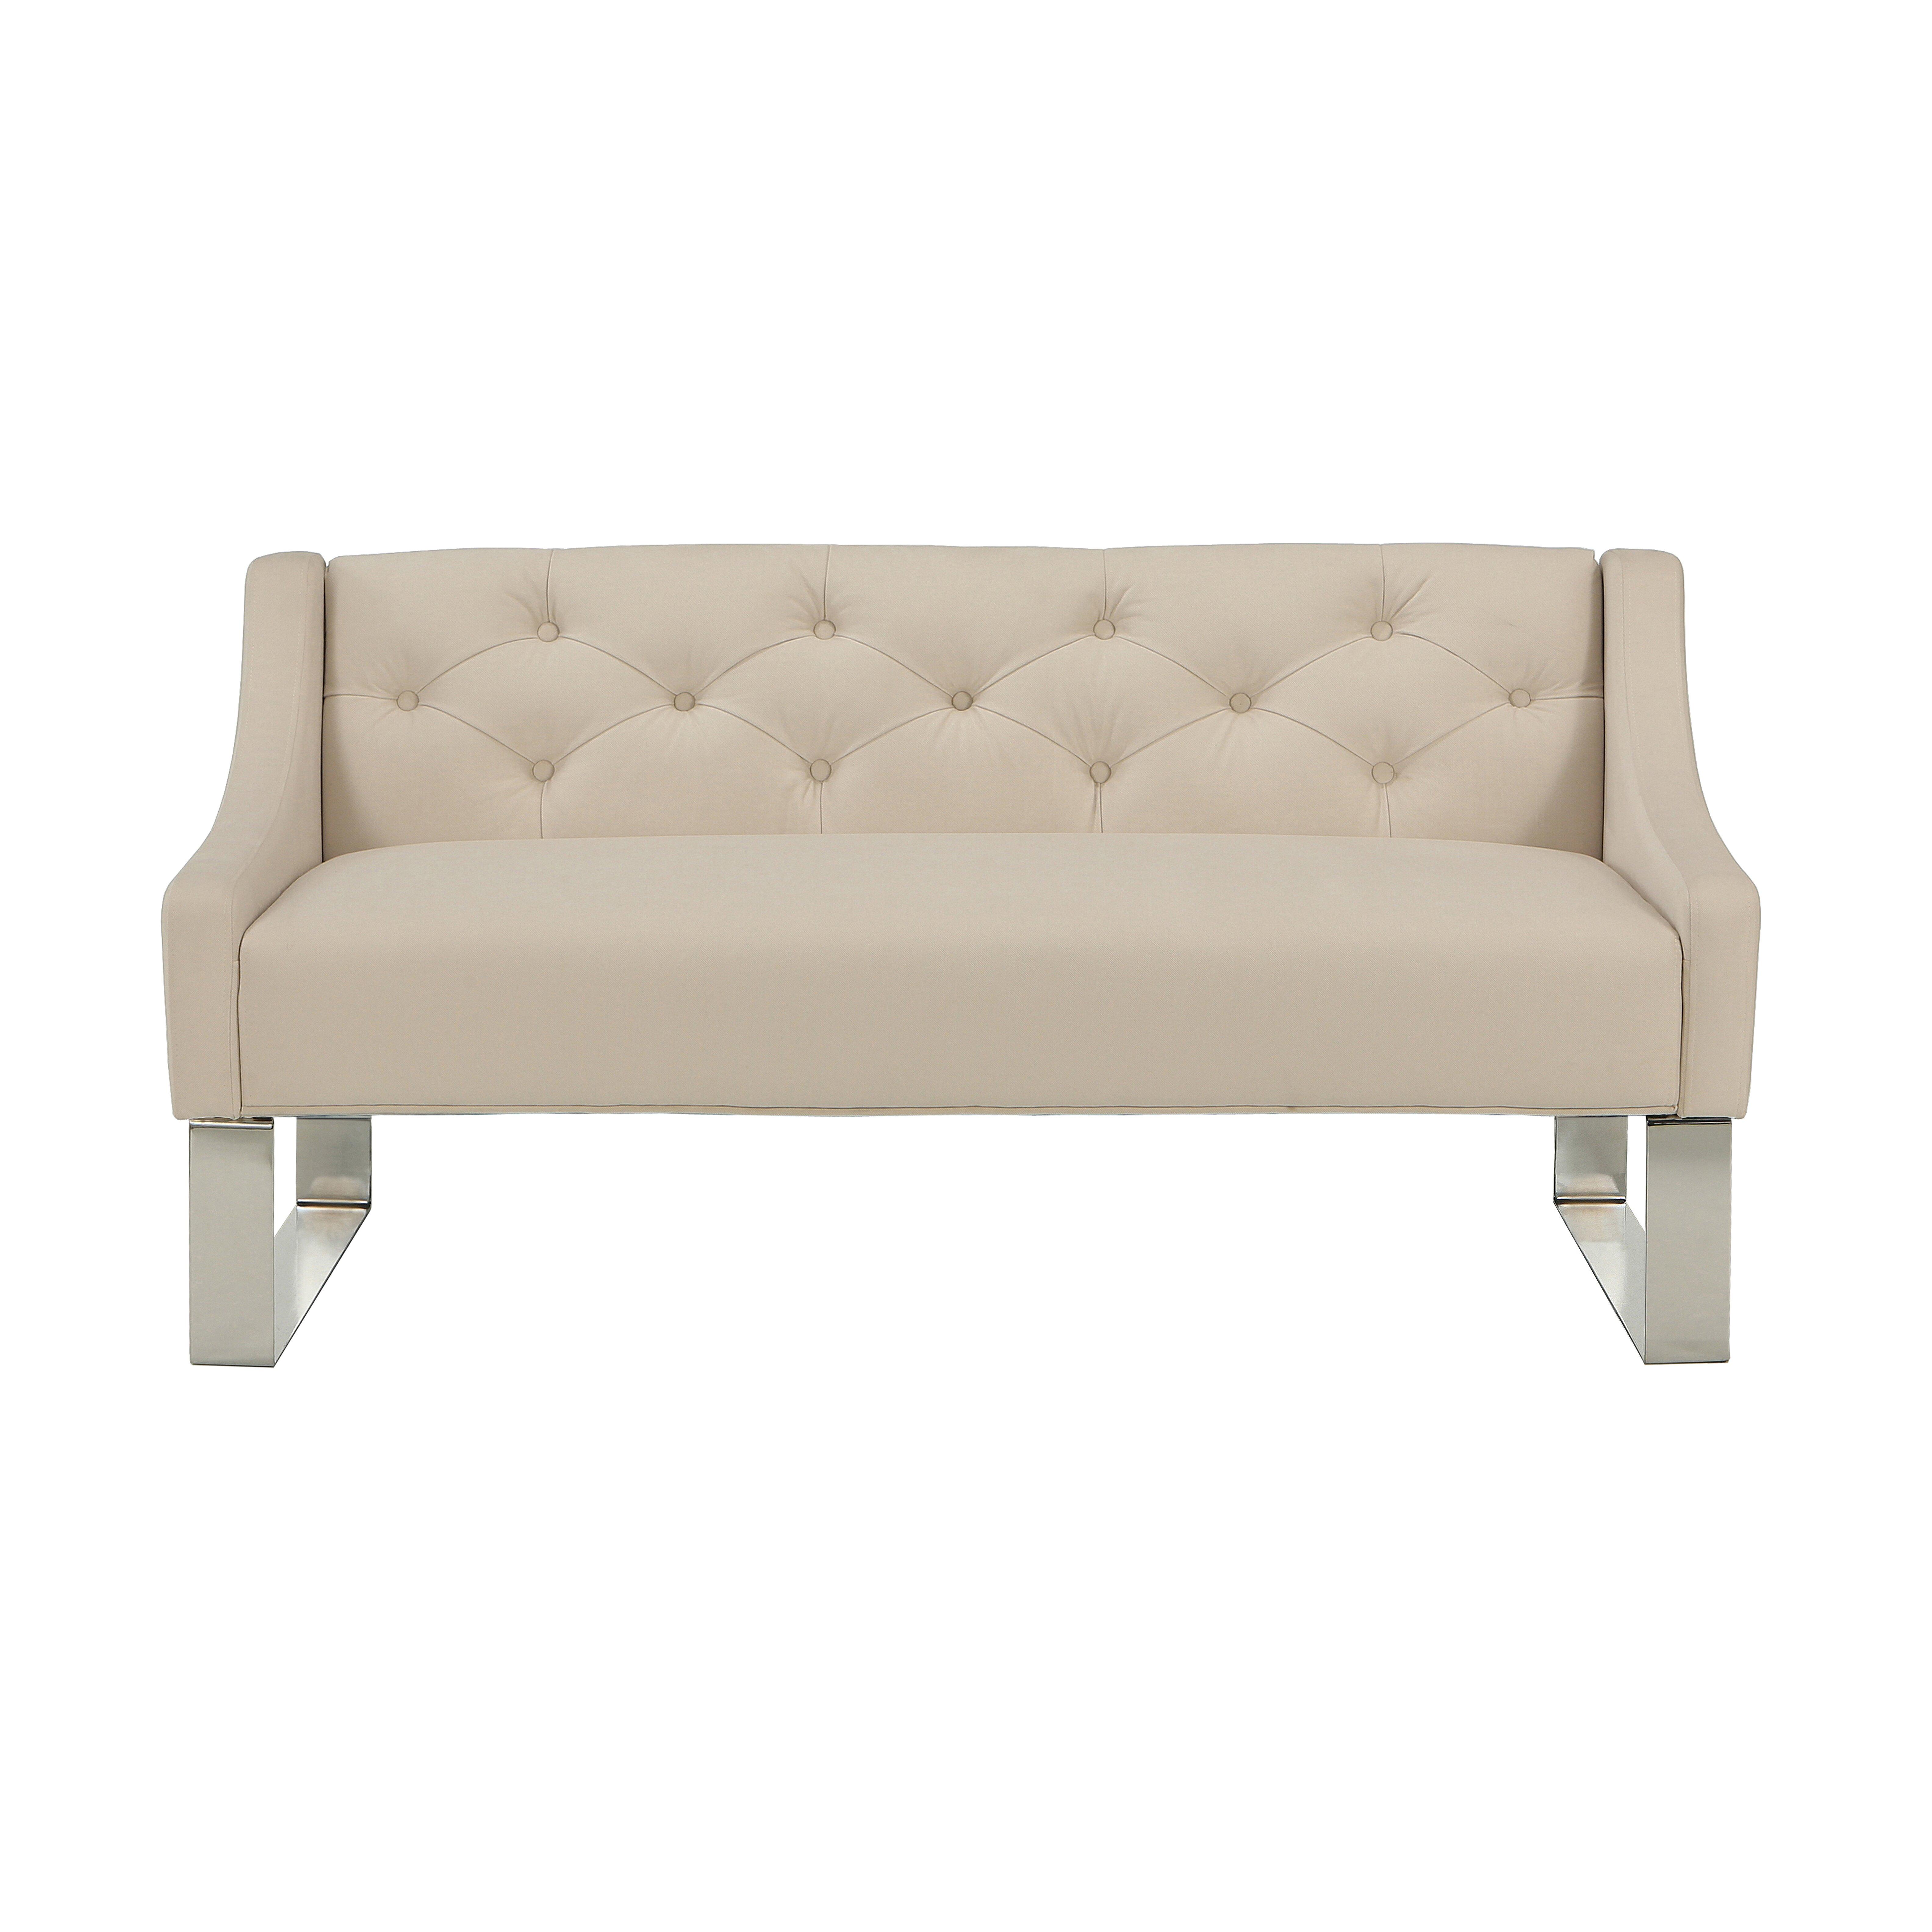 Republicdesignhouse Upholstered Bedroom Bench Reviews Wayfair